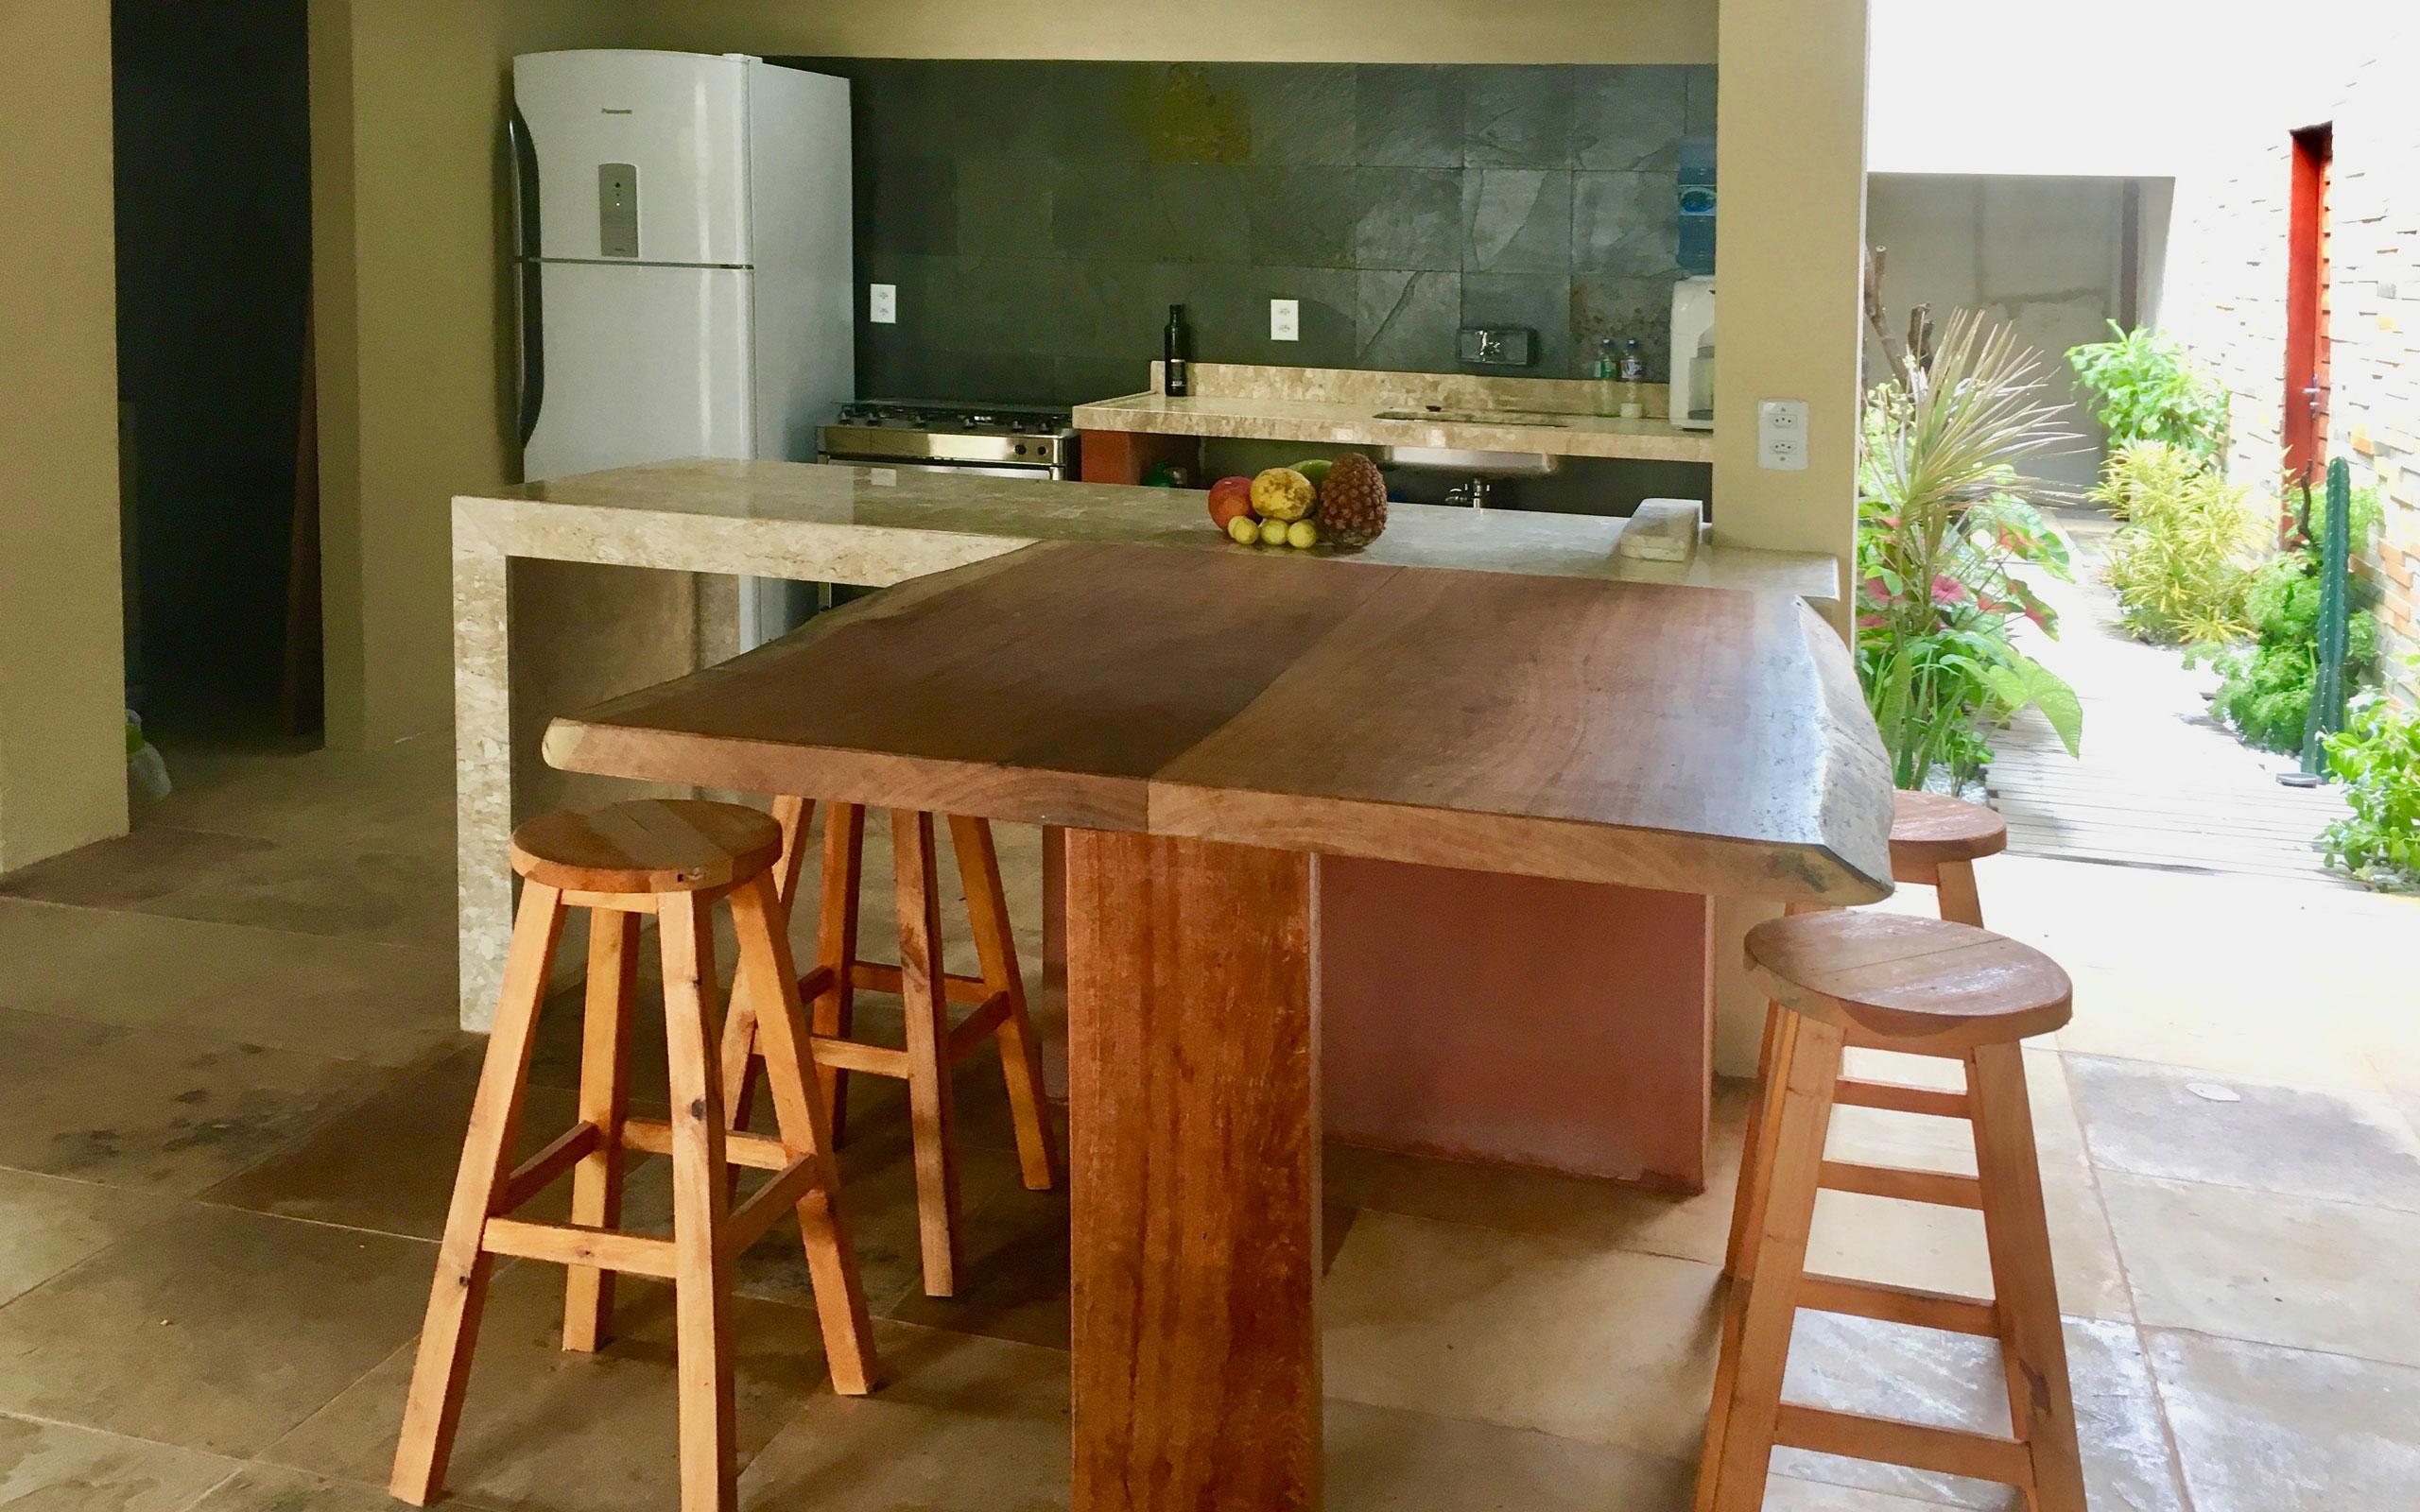 vilakapa-parajuru-bresil-maison-vila-kapa-cuisine-02a-2560